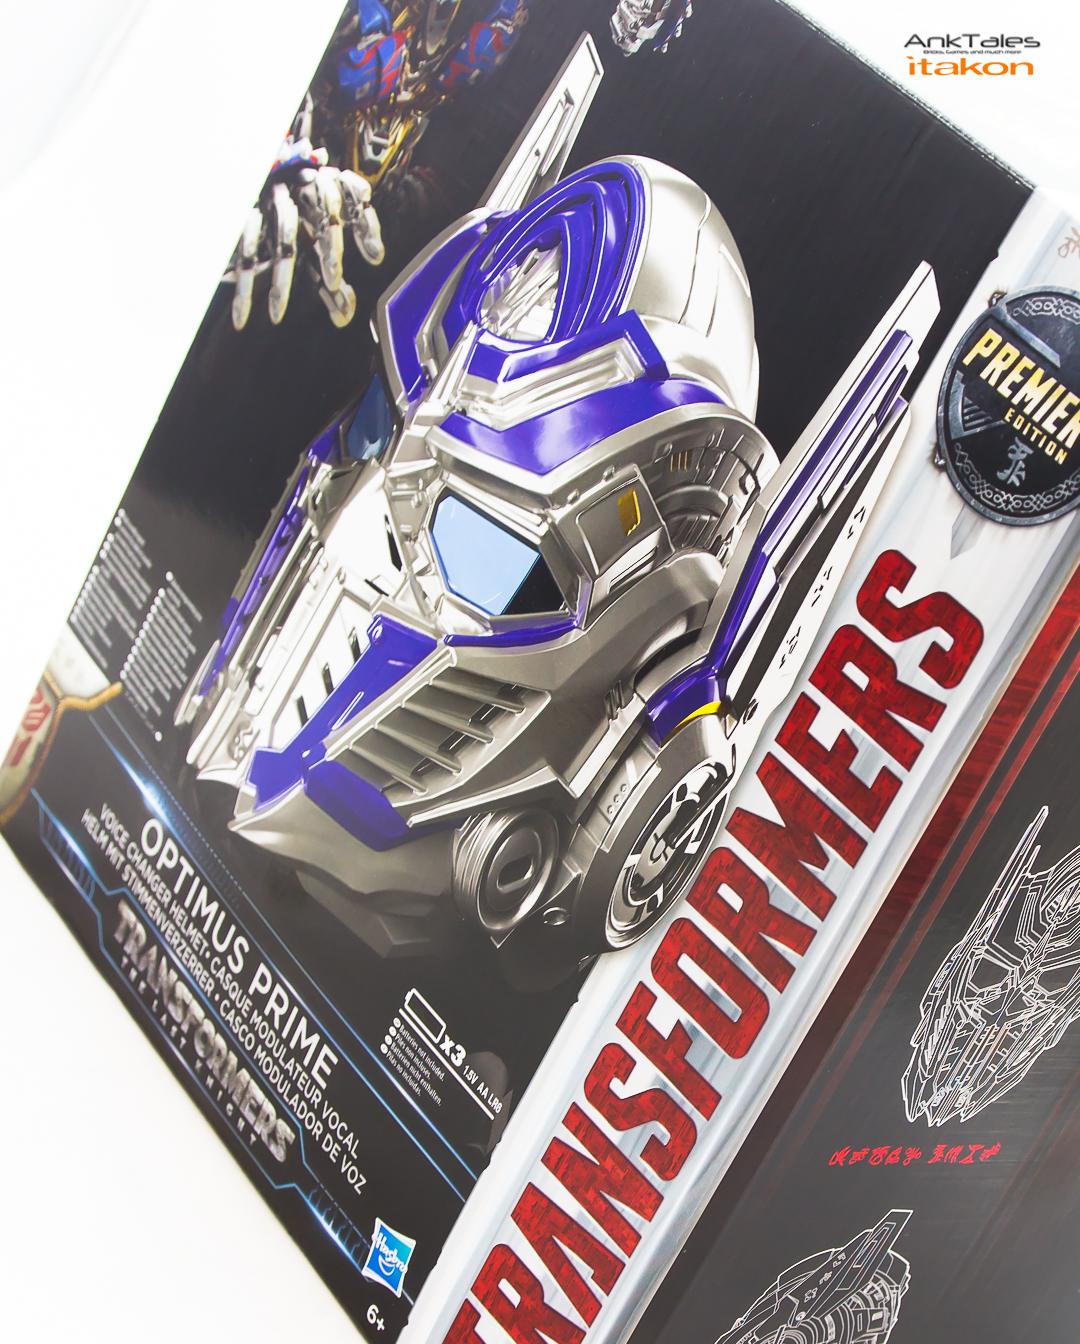 Link a Hasbro Optimus Prime helmet Anktales Itakon_0007